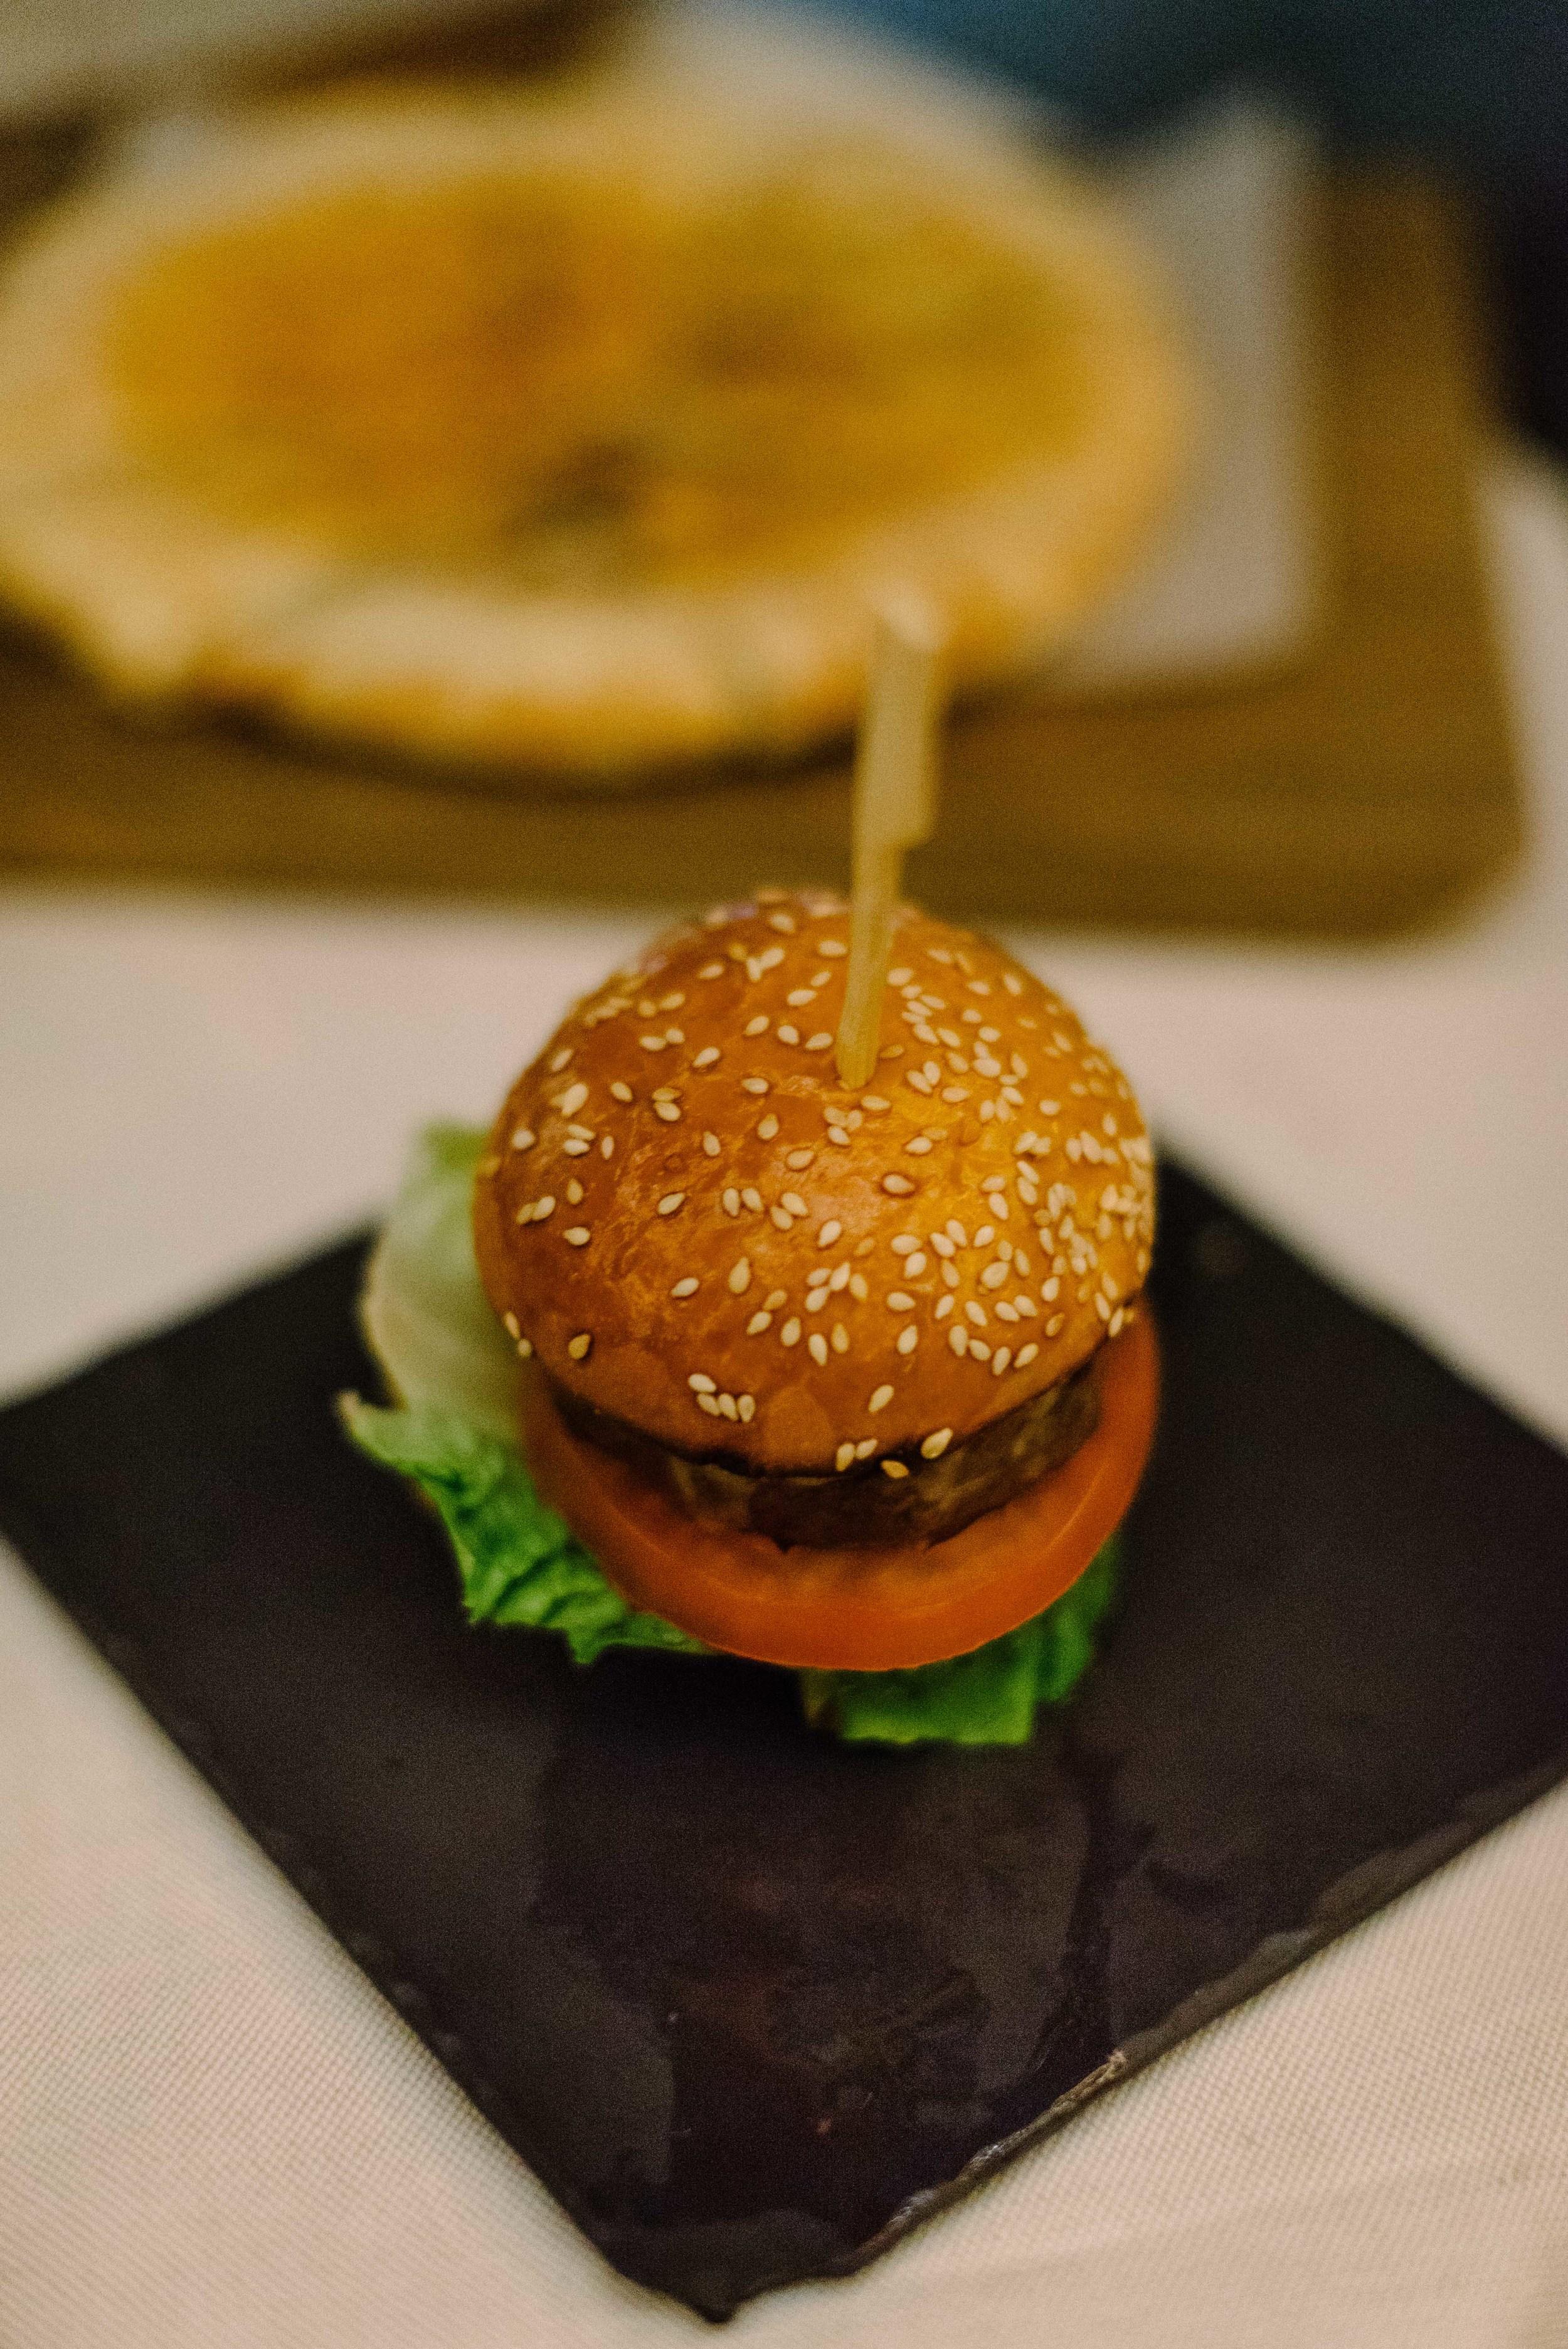 The incredibly tasty black angus mini burger (we had one each)